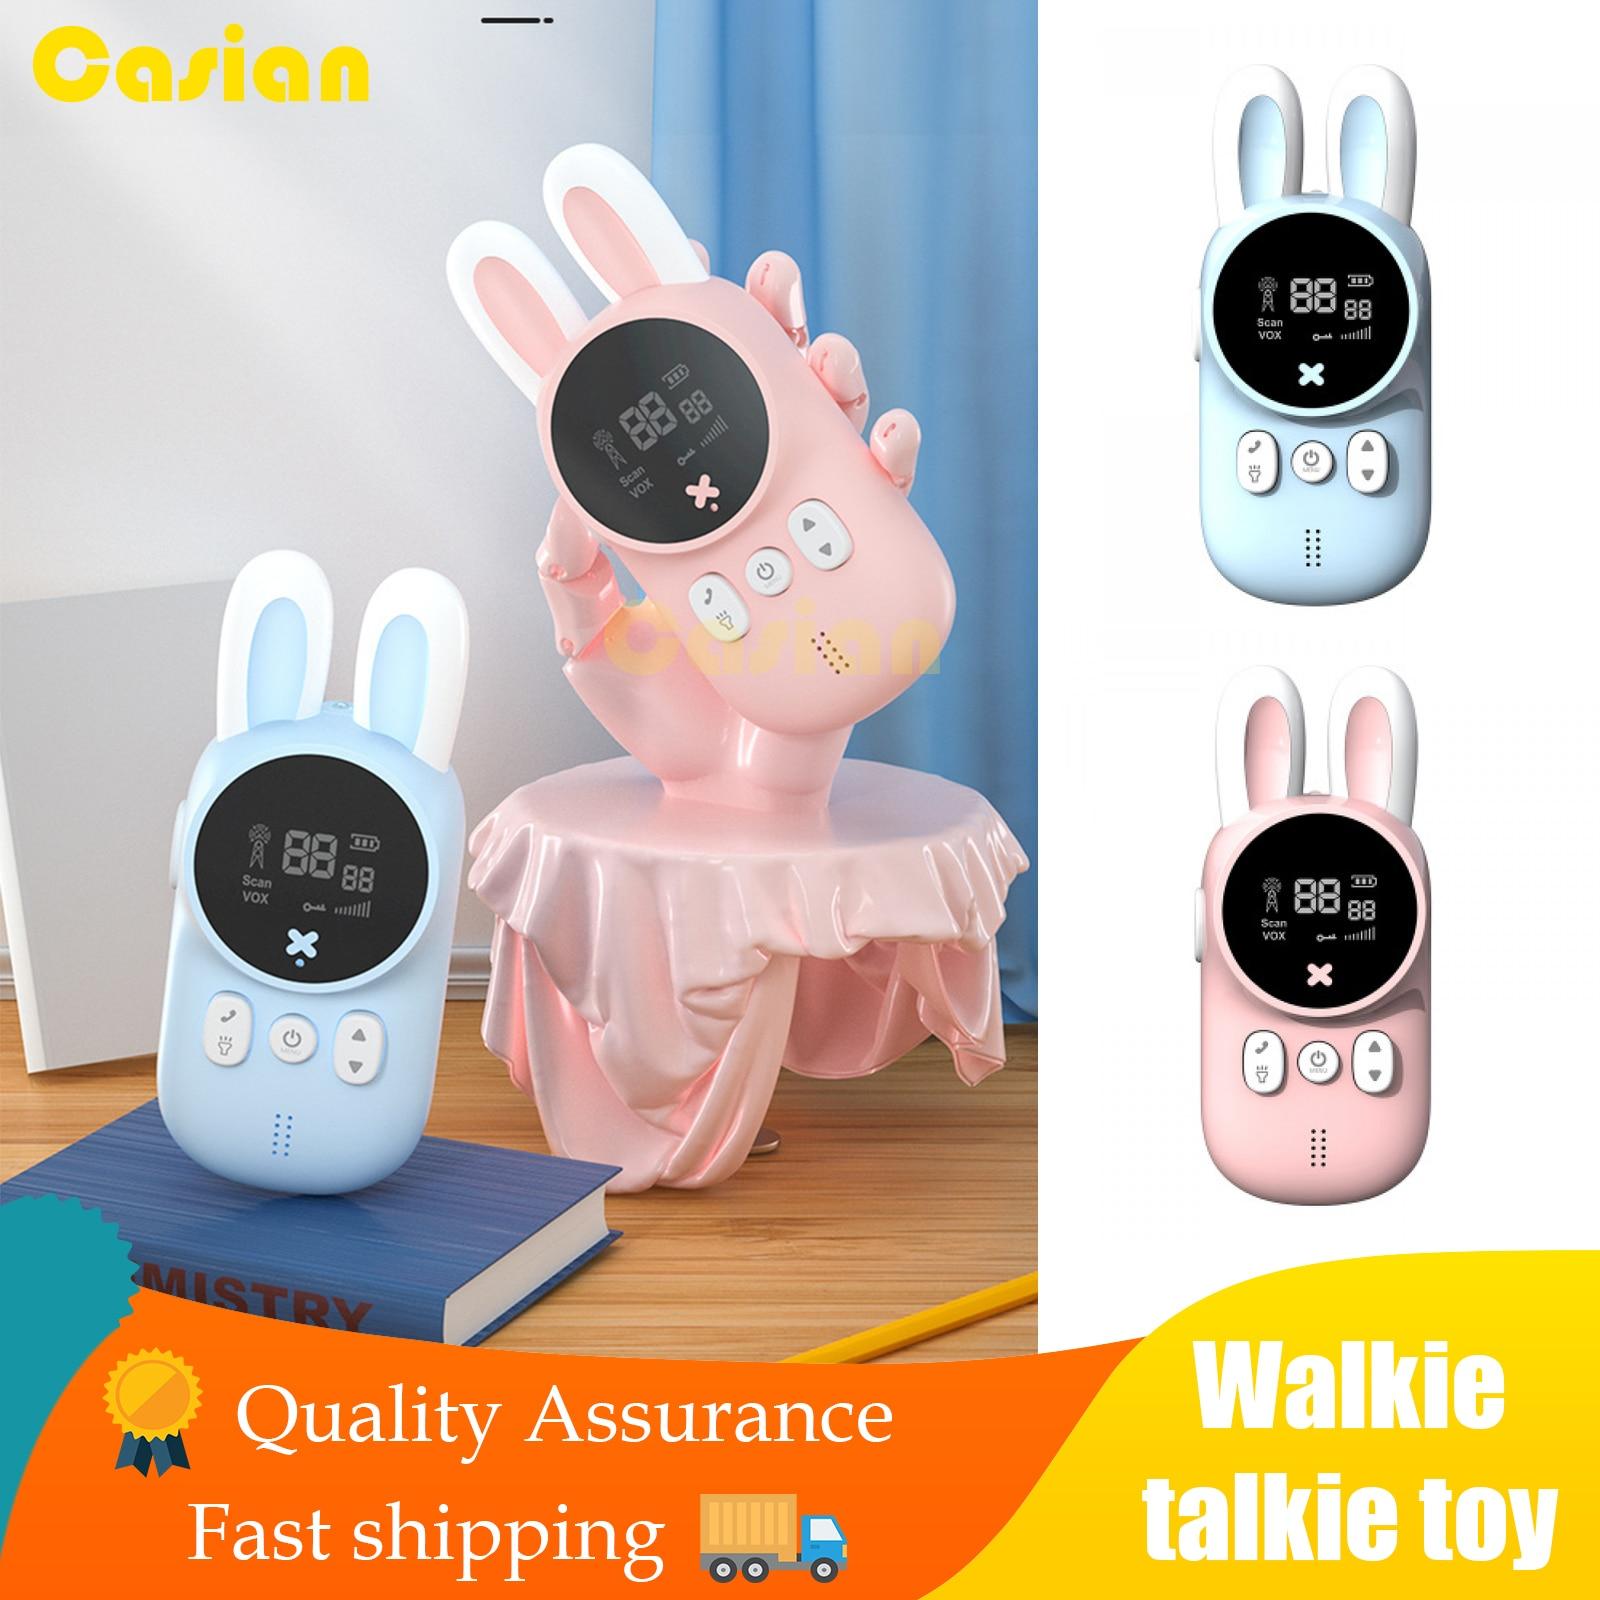 2pcs/Set Children's Walkie Talkie Kids Electronic Spy Gadgets Handheld Transceiver 3KM Range UHF Radio Interphone Toys For Boys